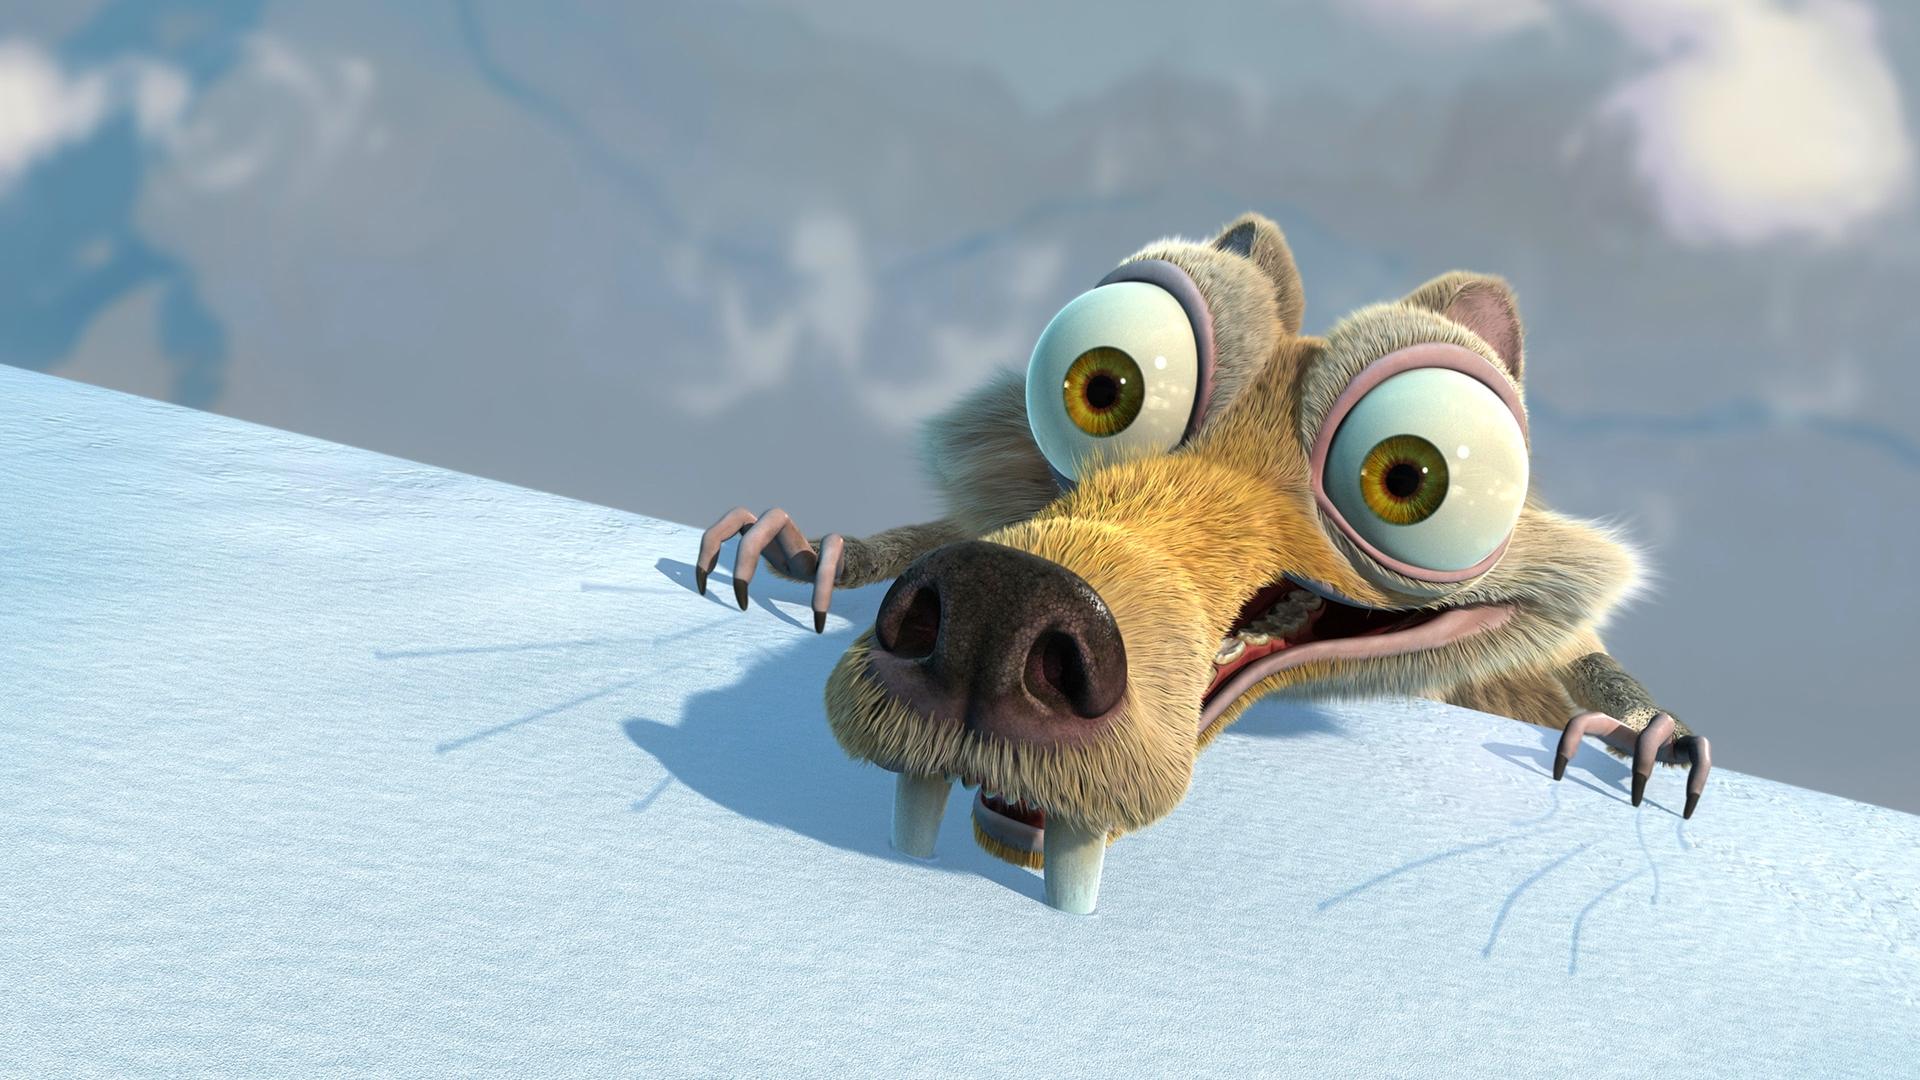 Ice Age 2 Wallpaper